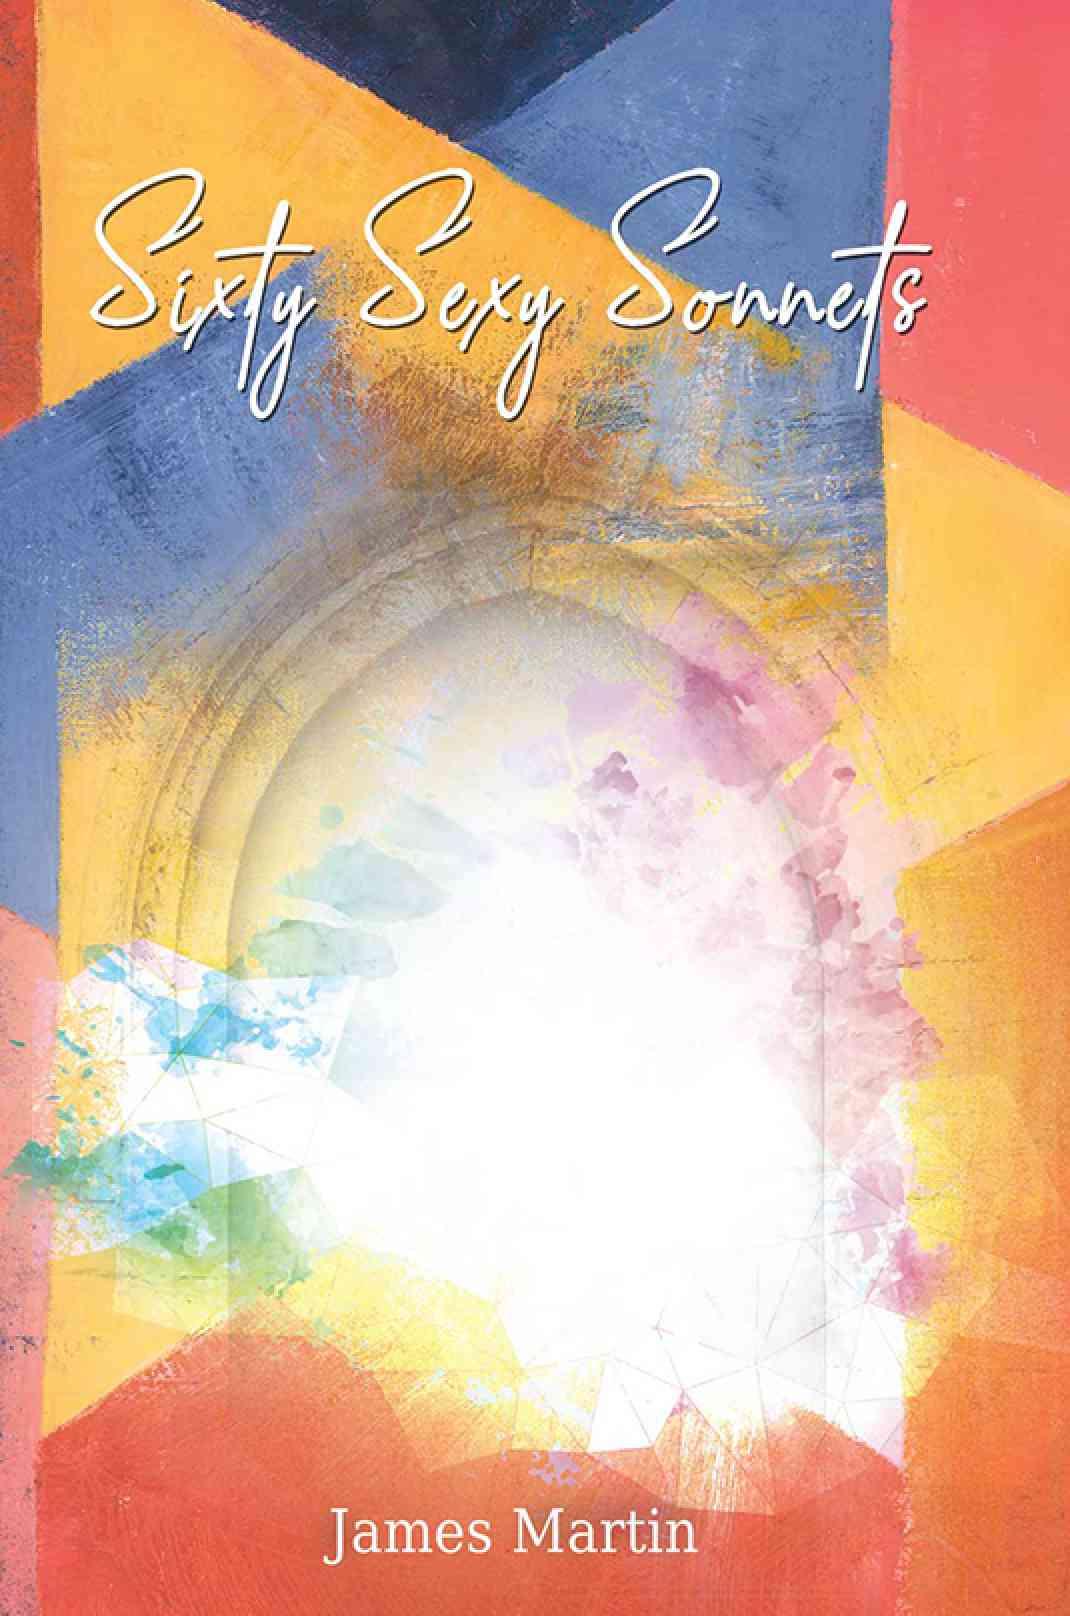 Sixty Sexy Sonnets | Book| Austin Macauley Publishers